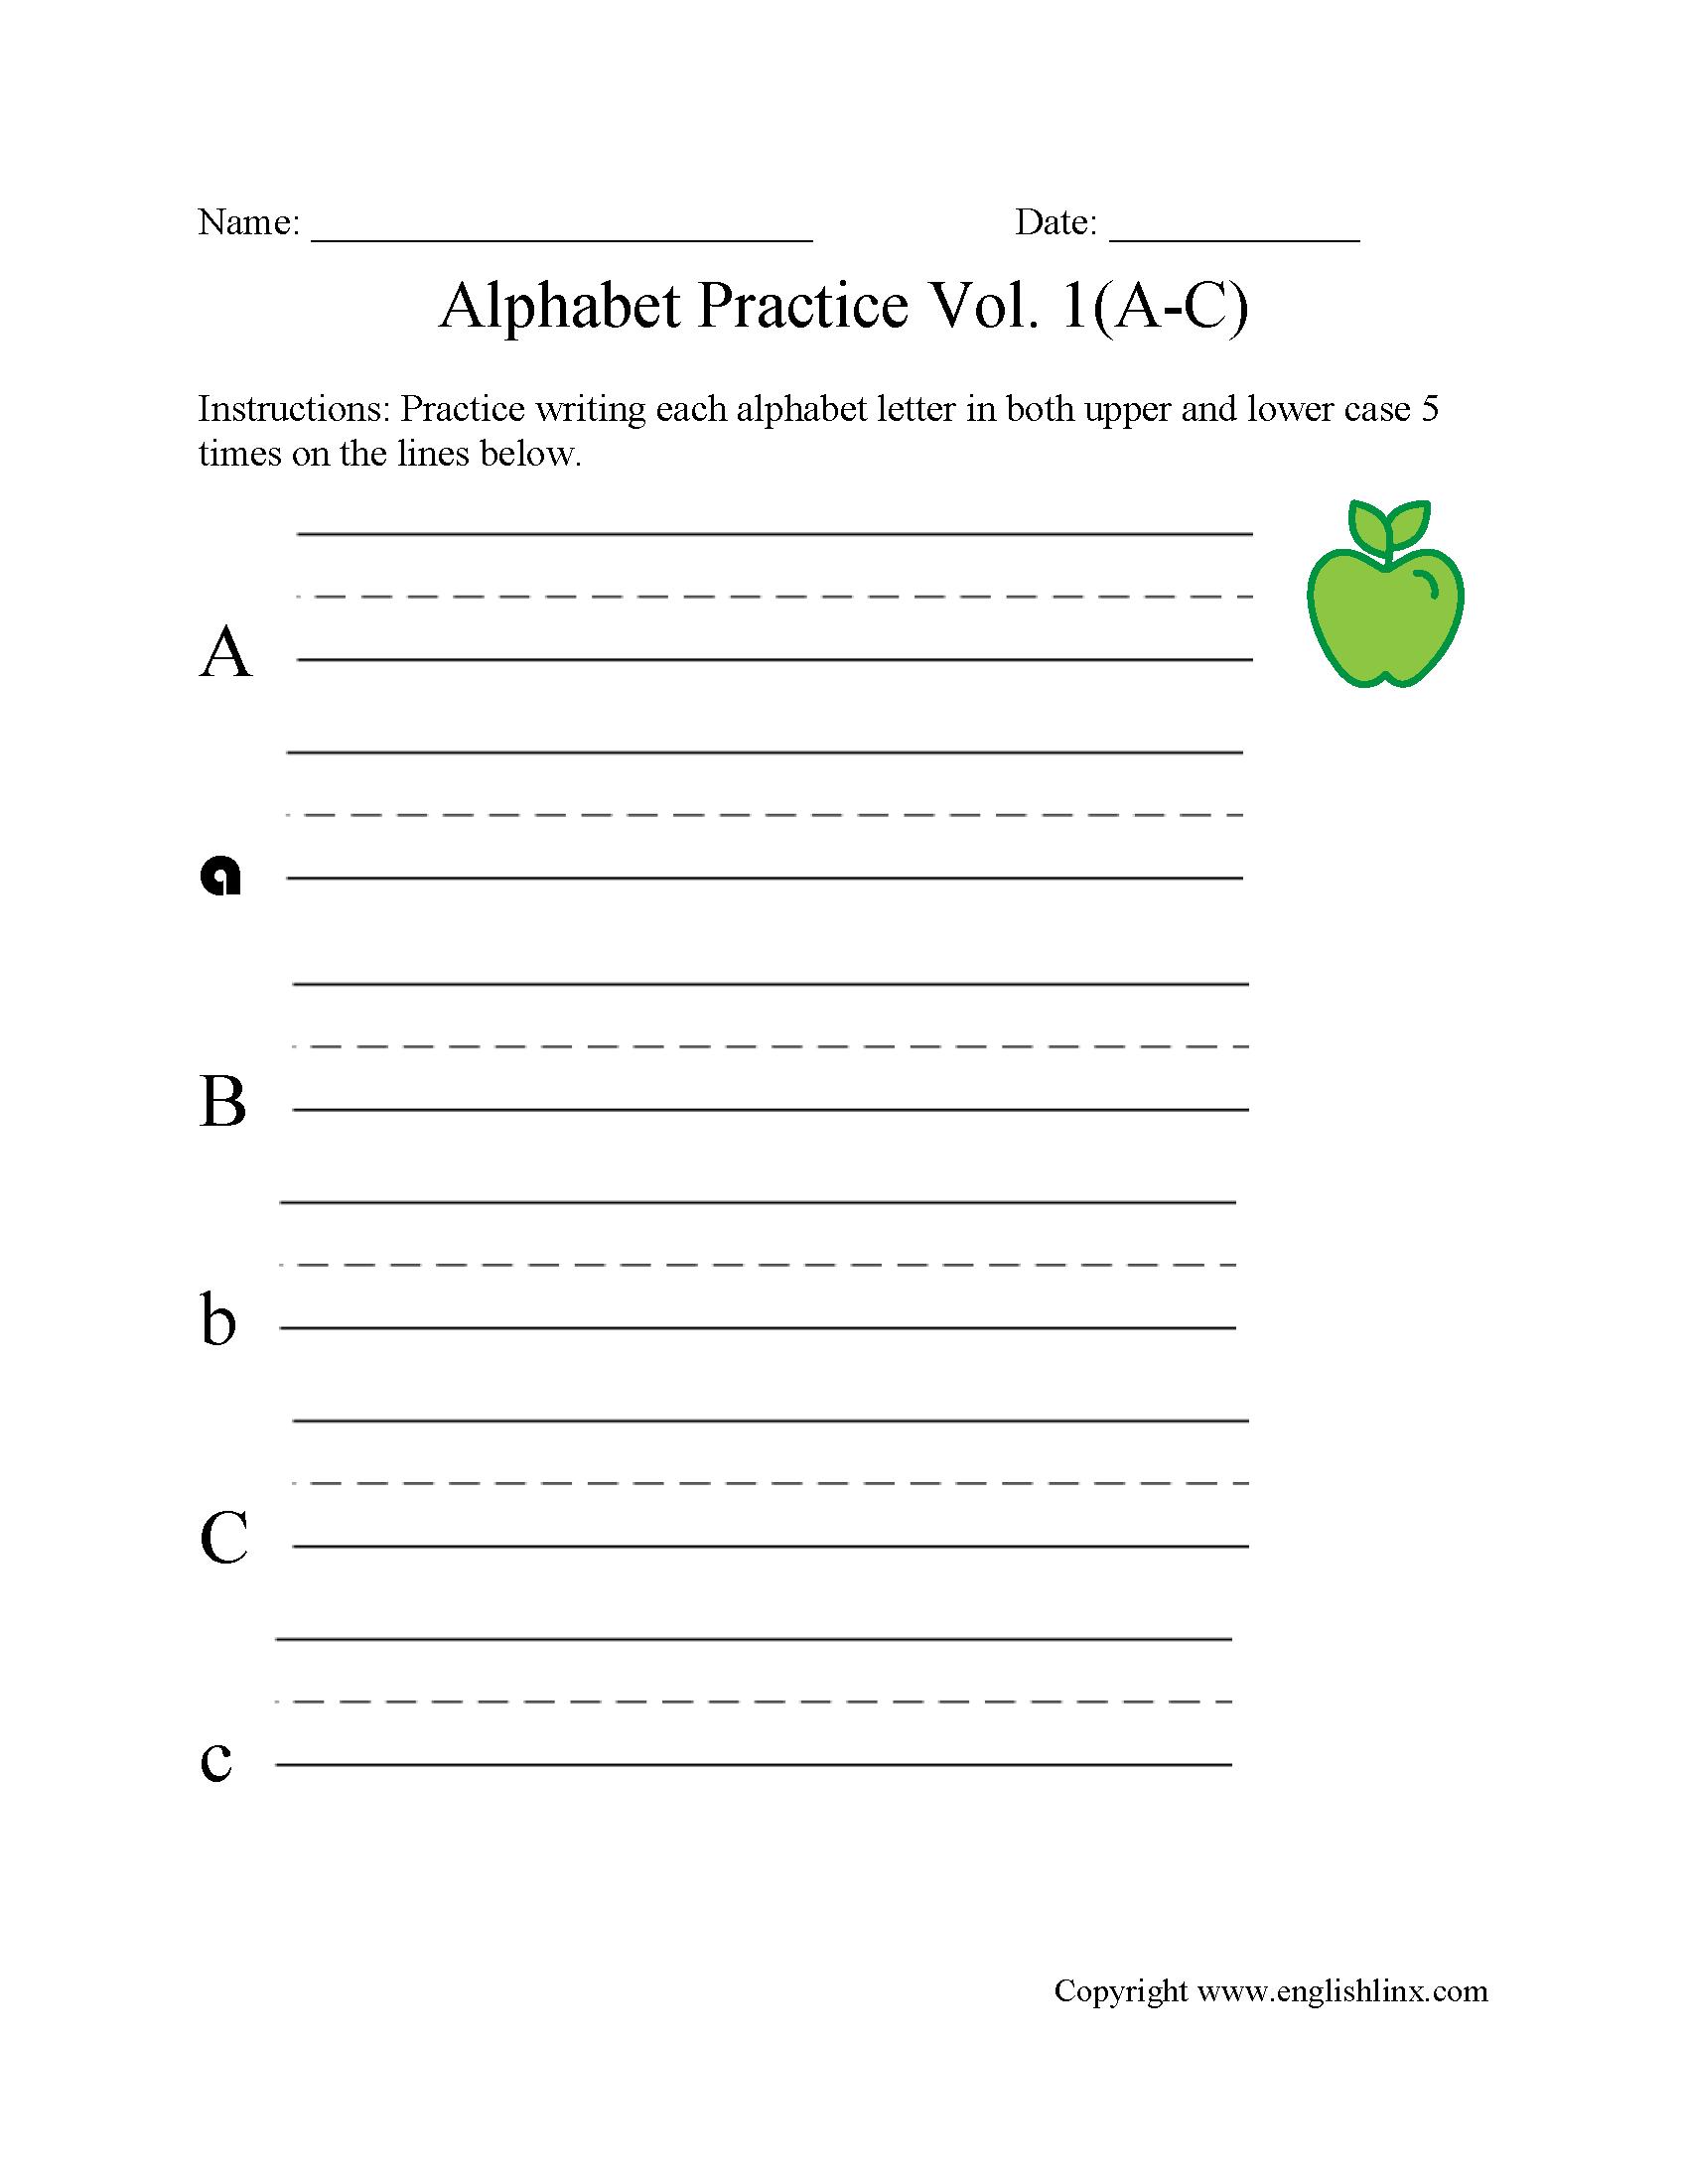 Englishlinx | Alphabet Worksheets with regard to 4 Line Alphabet Worksheets